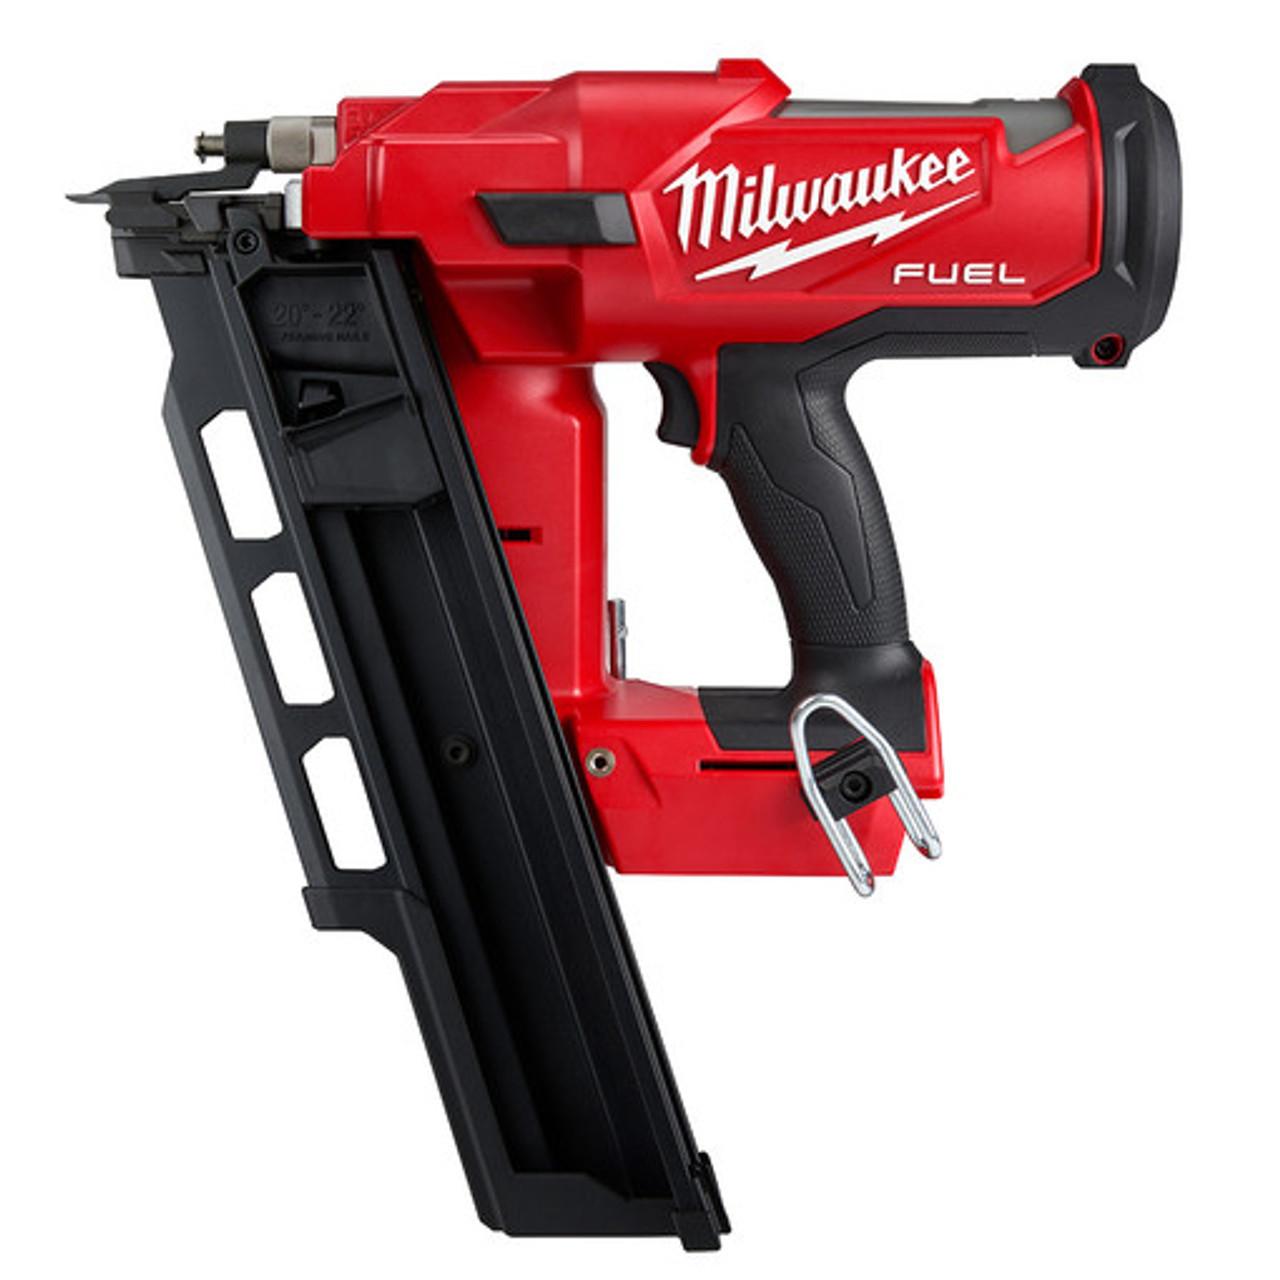 Milwaukee 2744-20 M18 FUEL 21 Degree Framing Nailer